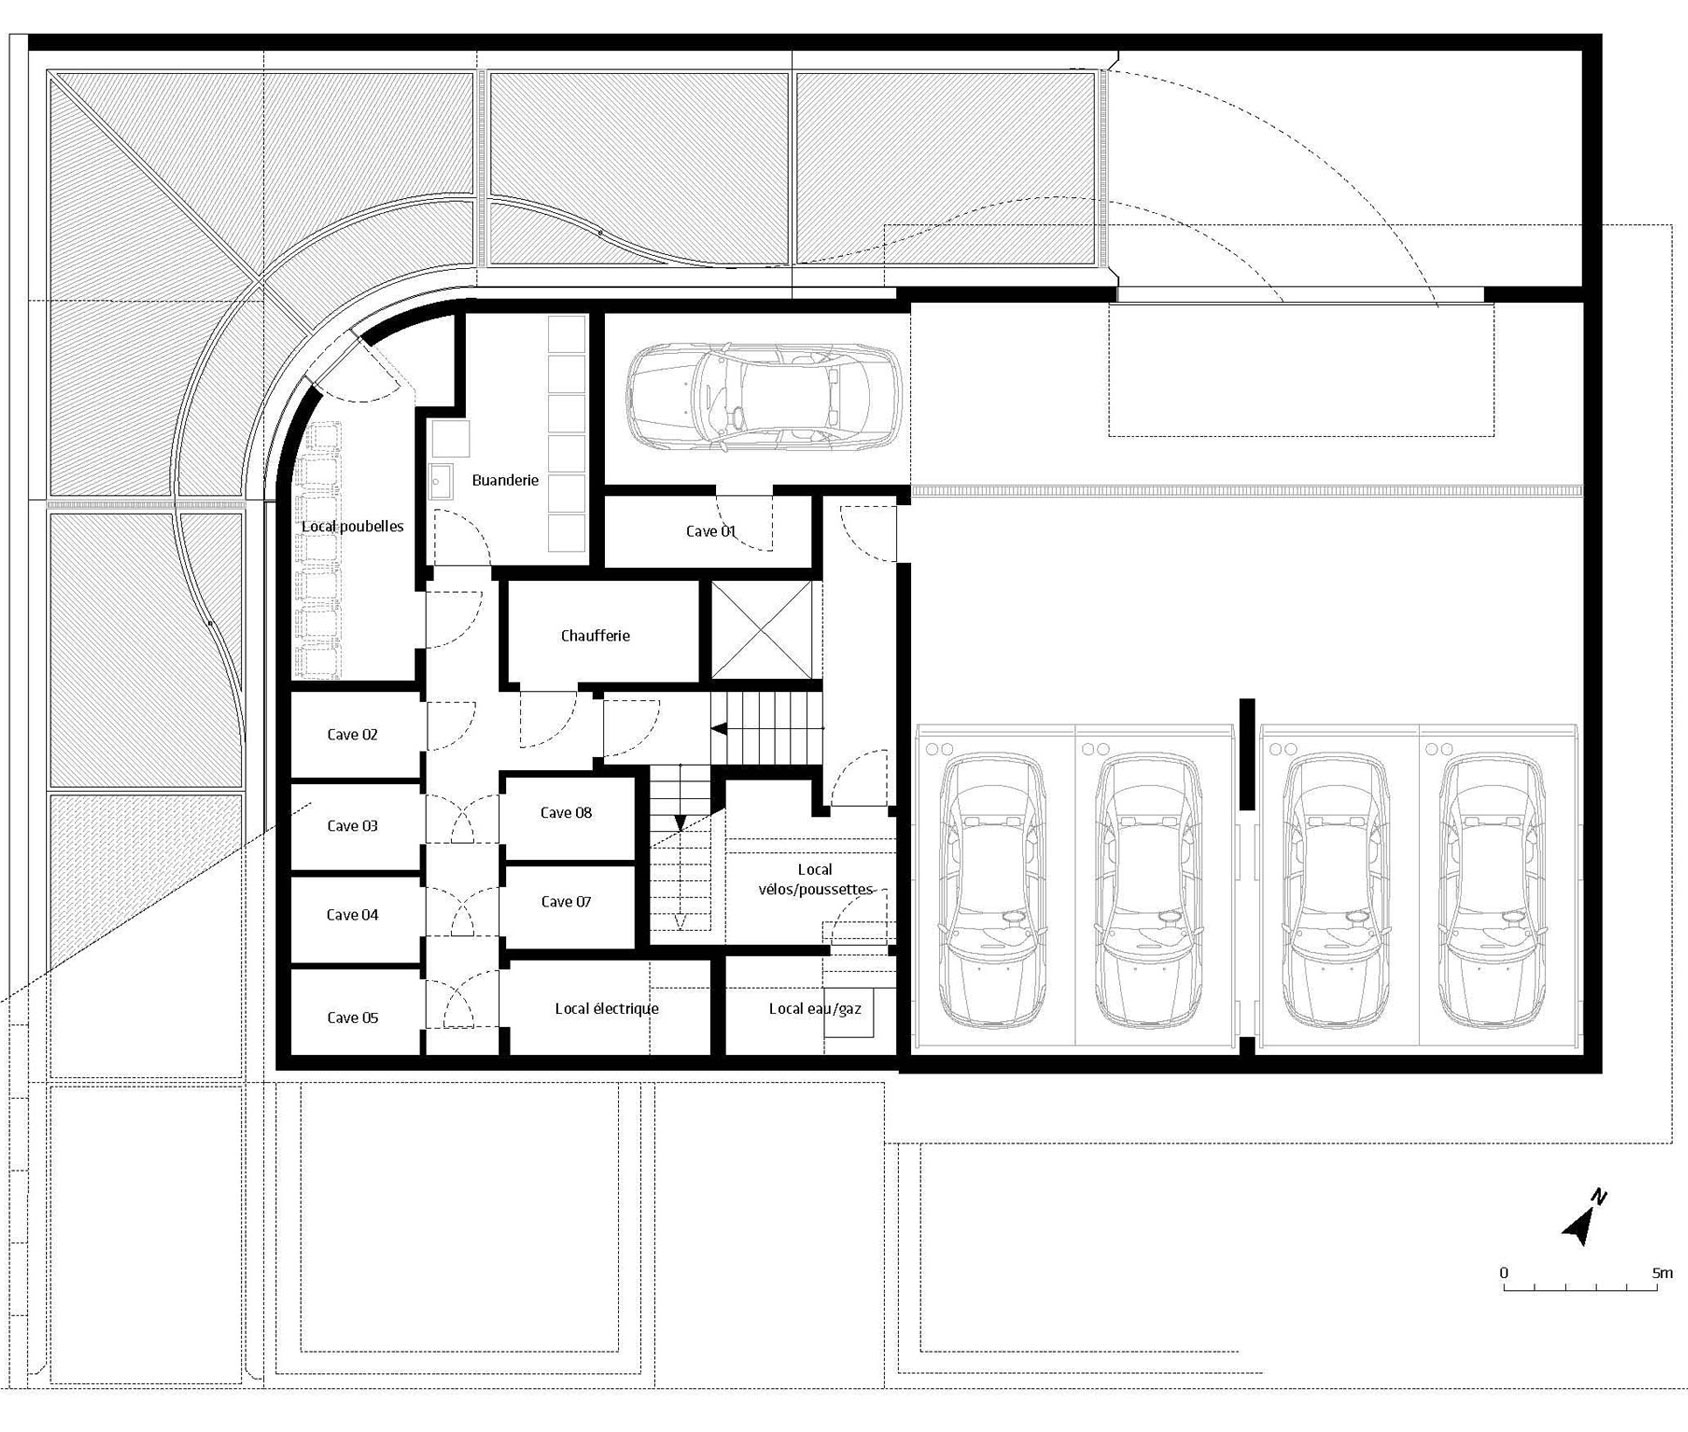 Housing-Building-12